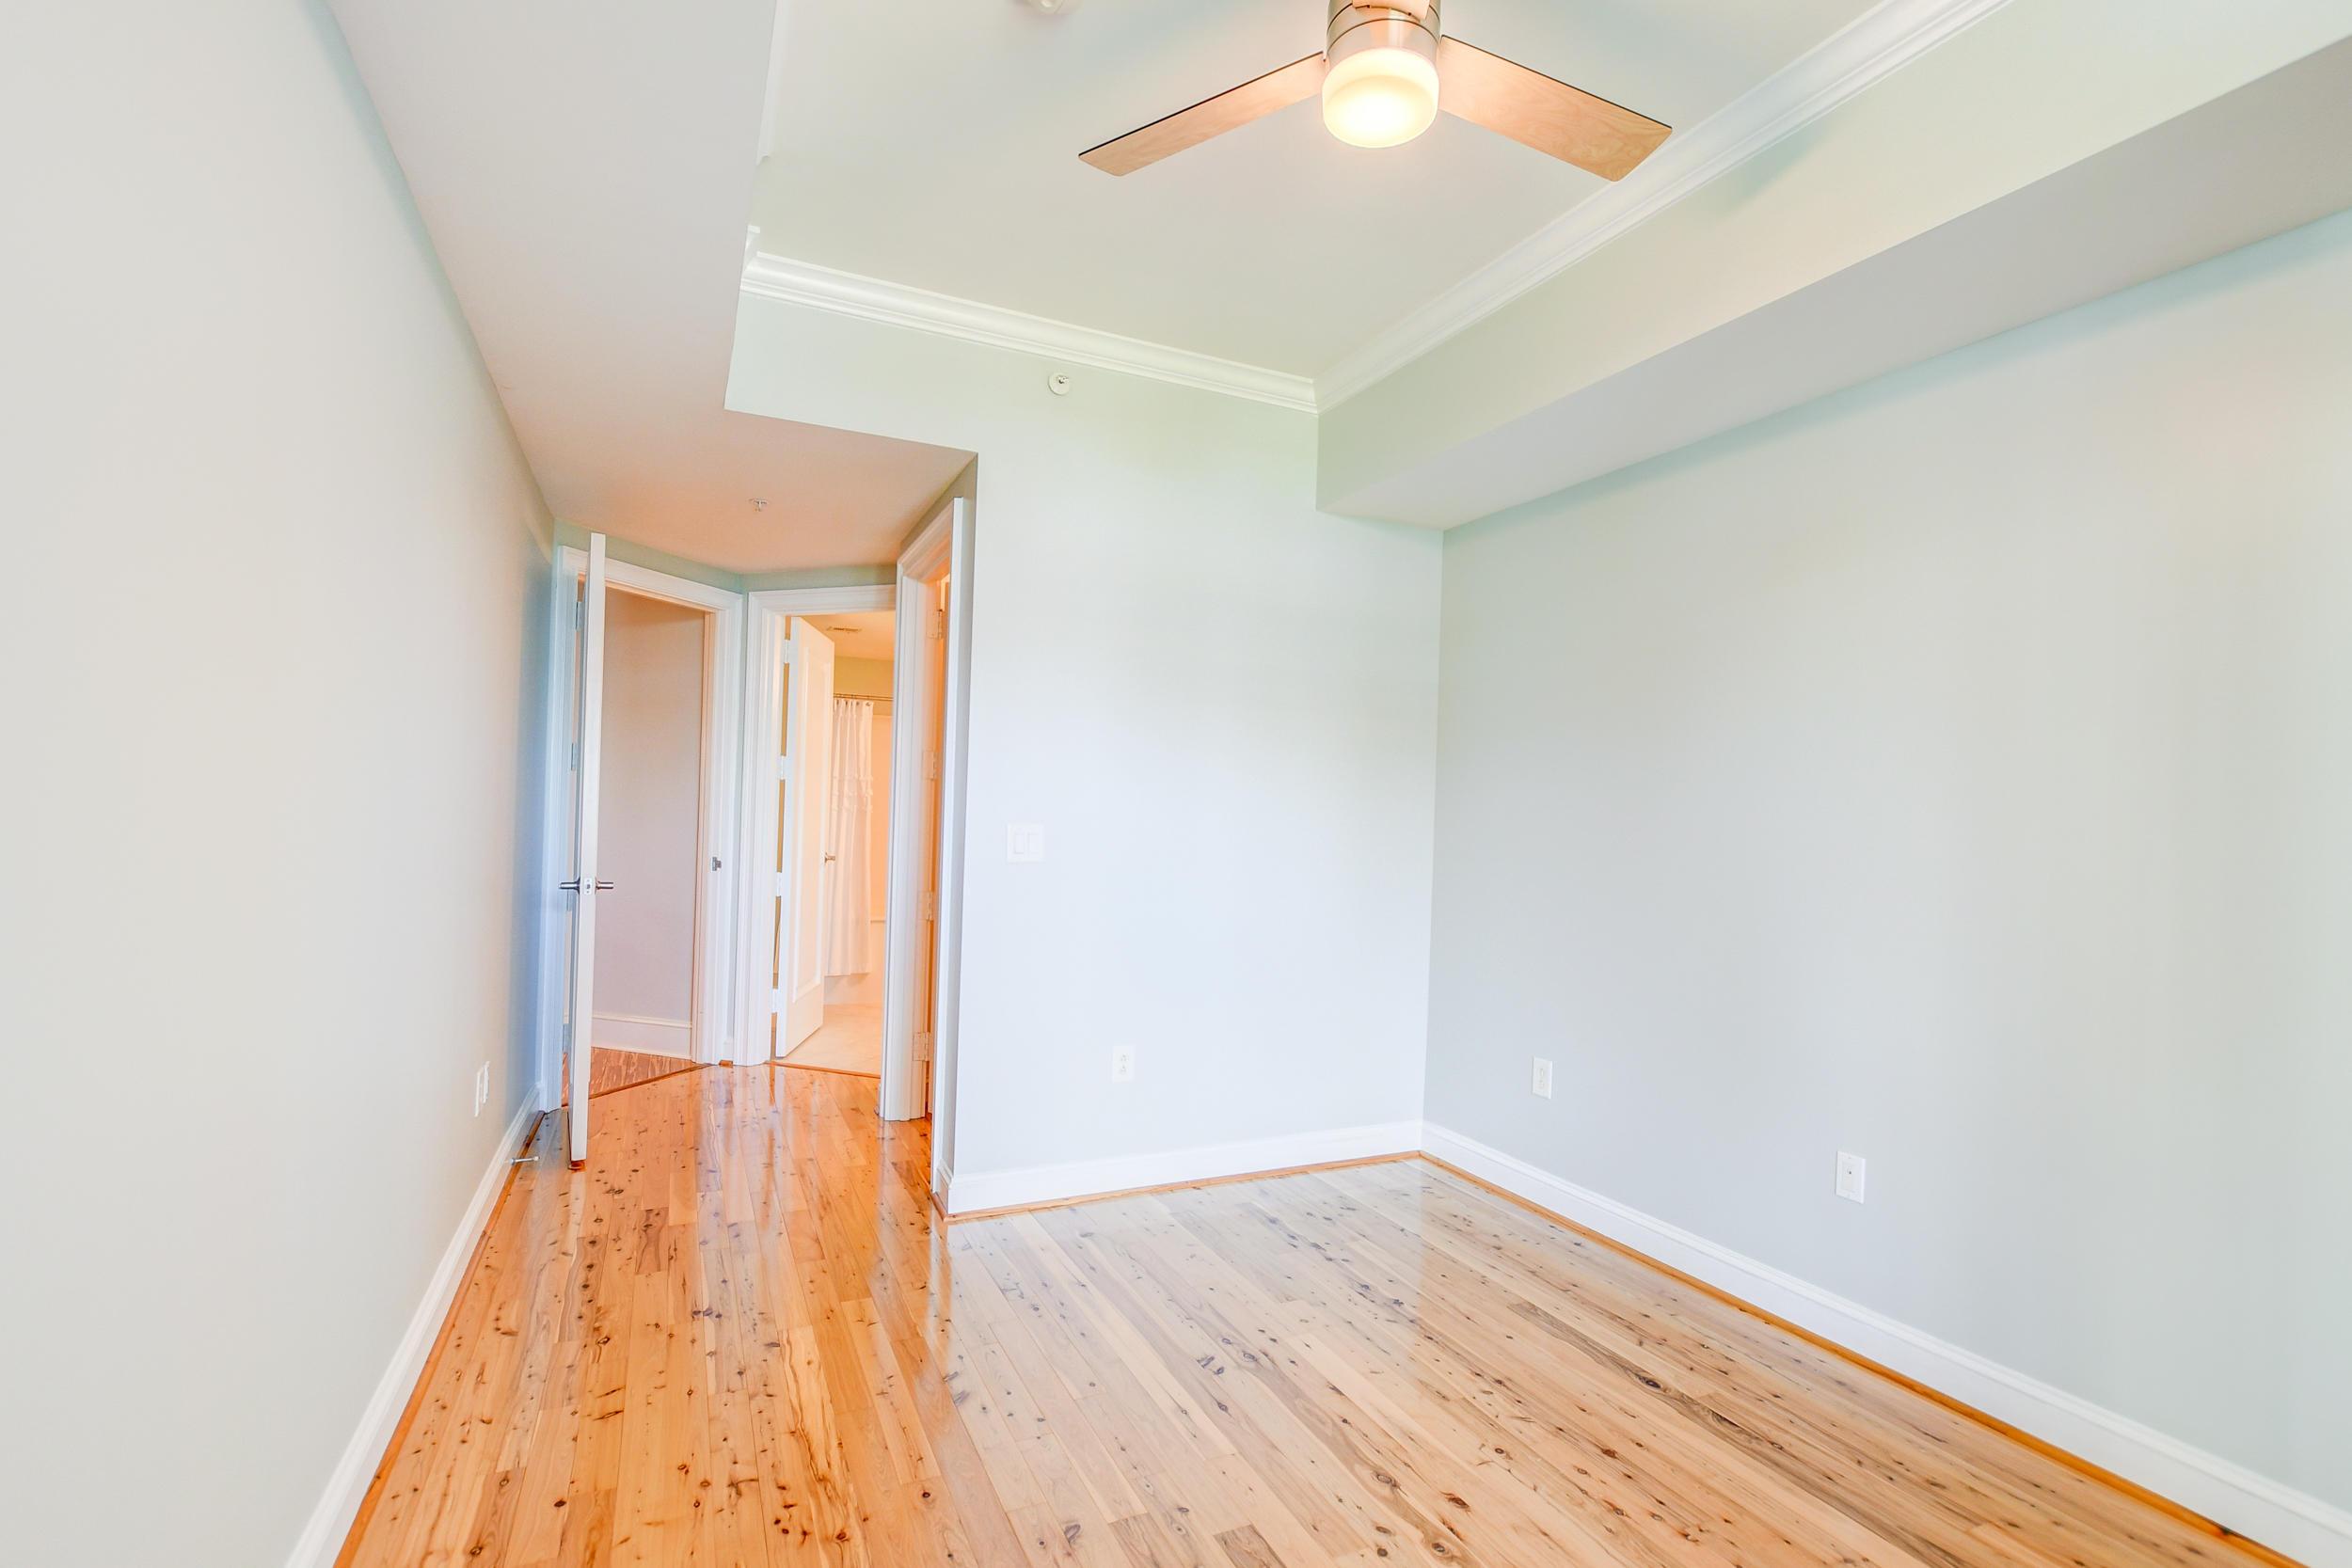 Renaissance On Chas Harbor Homes For Sale - 224 Plaza, Mount Pleasant, SC - 23